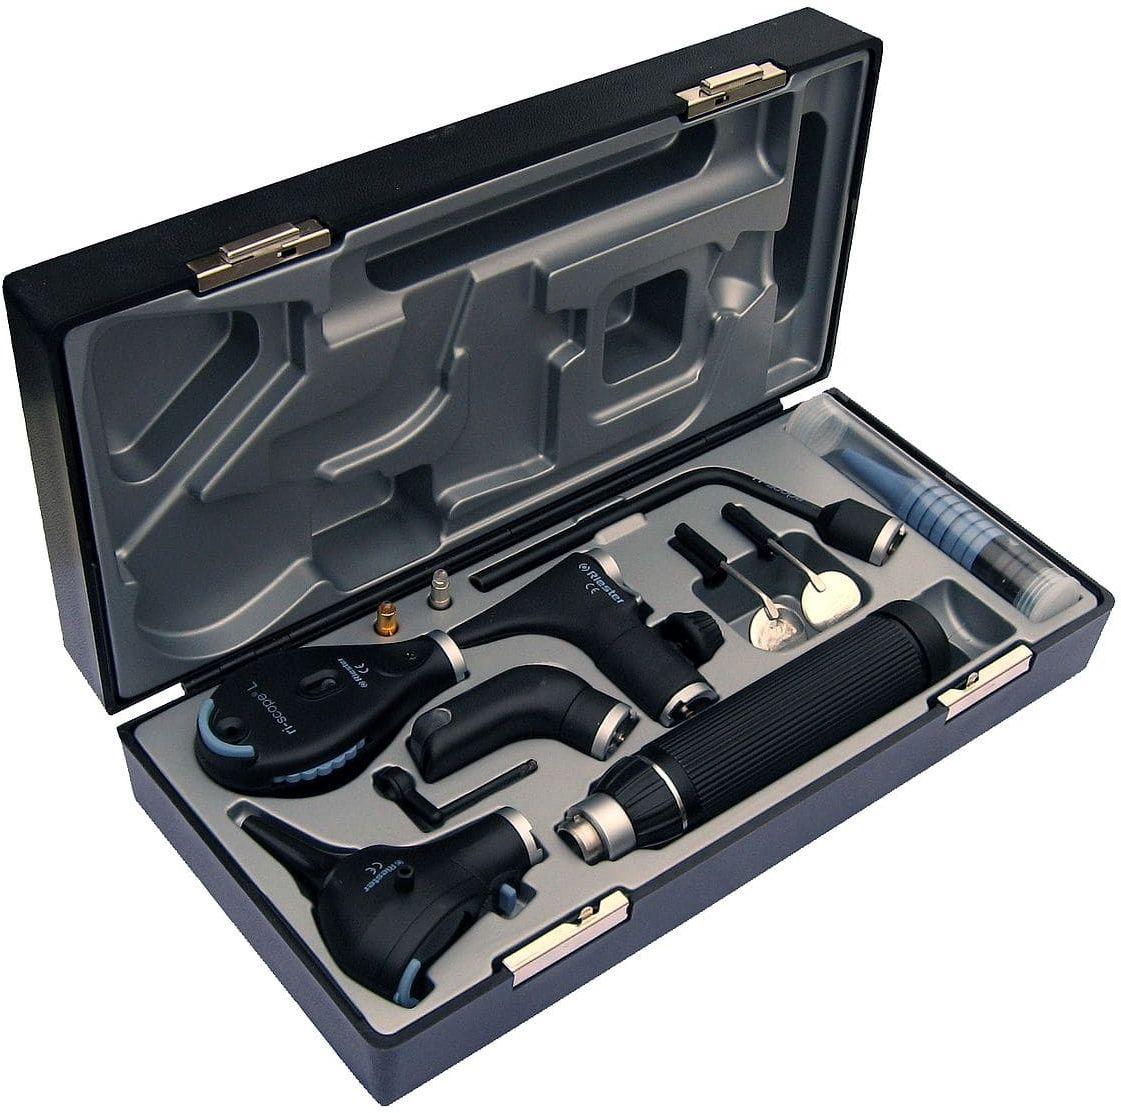 Riester ri-scope zestaw de-luxe otoskop L3 LED 2,5 V + oftalmoskop L2 LED 2,5 V rękojeść bateryjna typu C